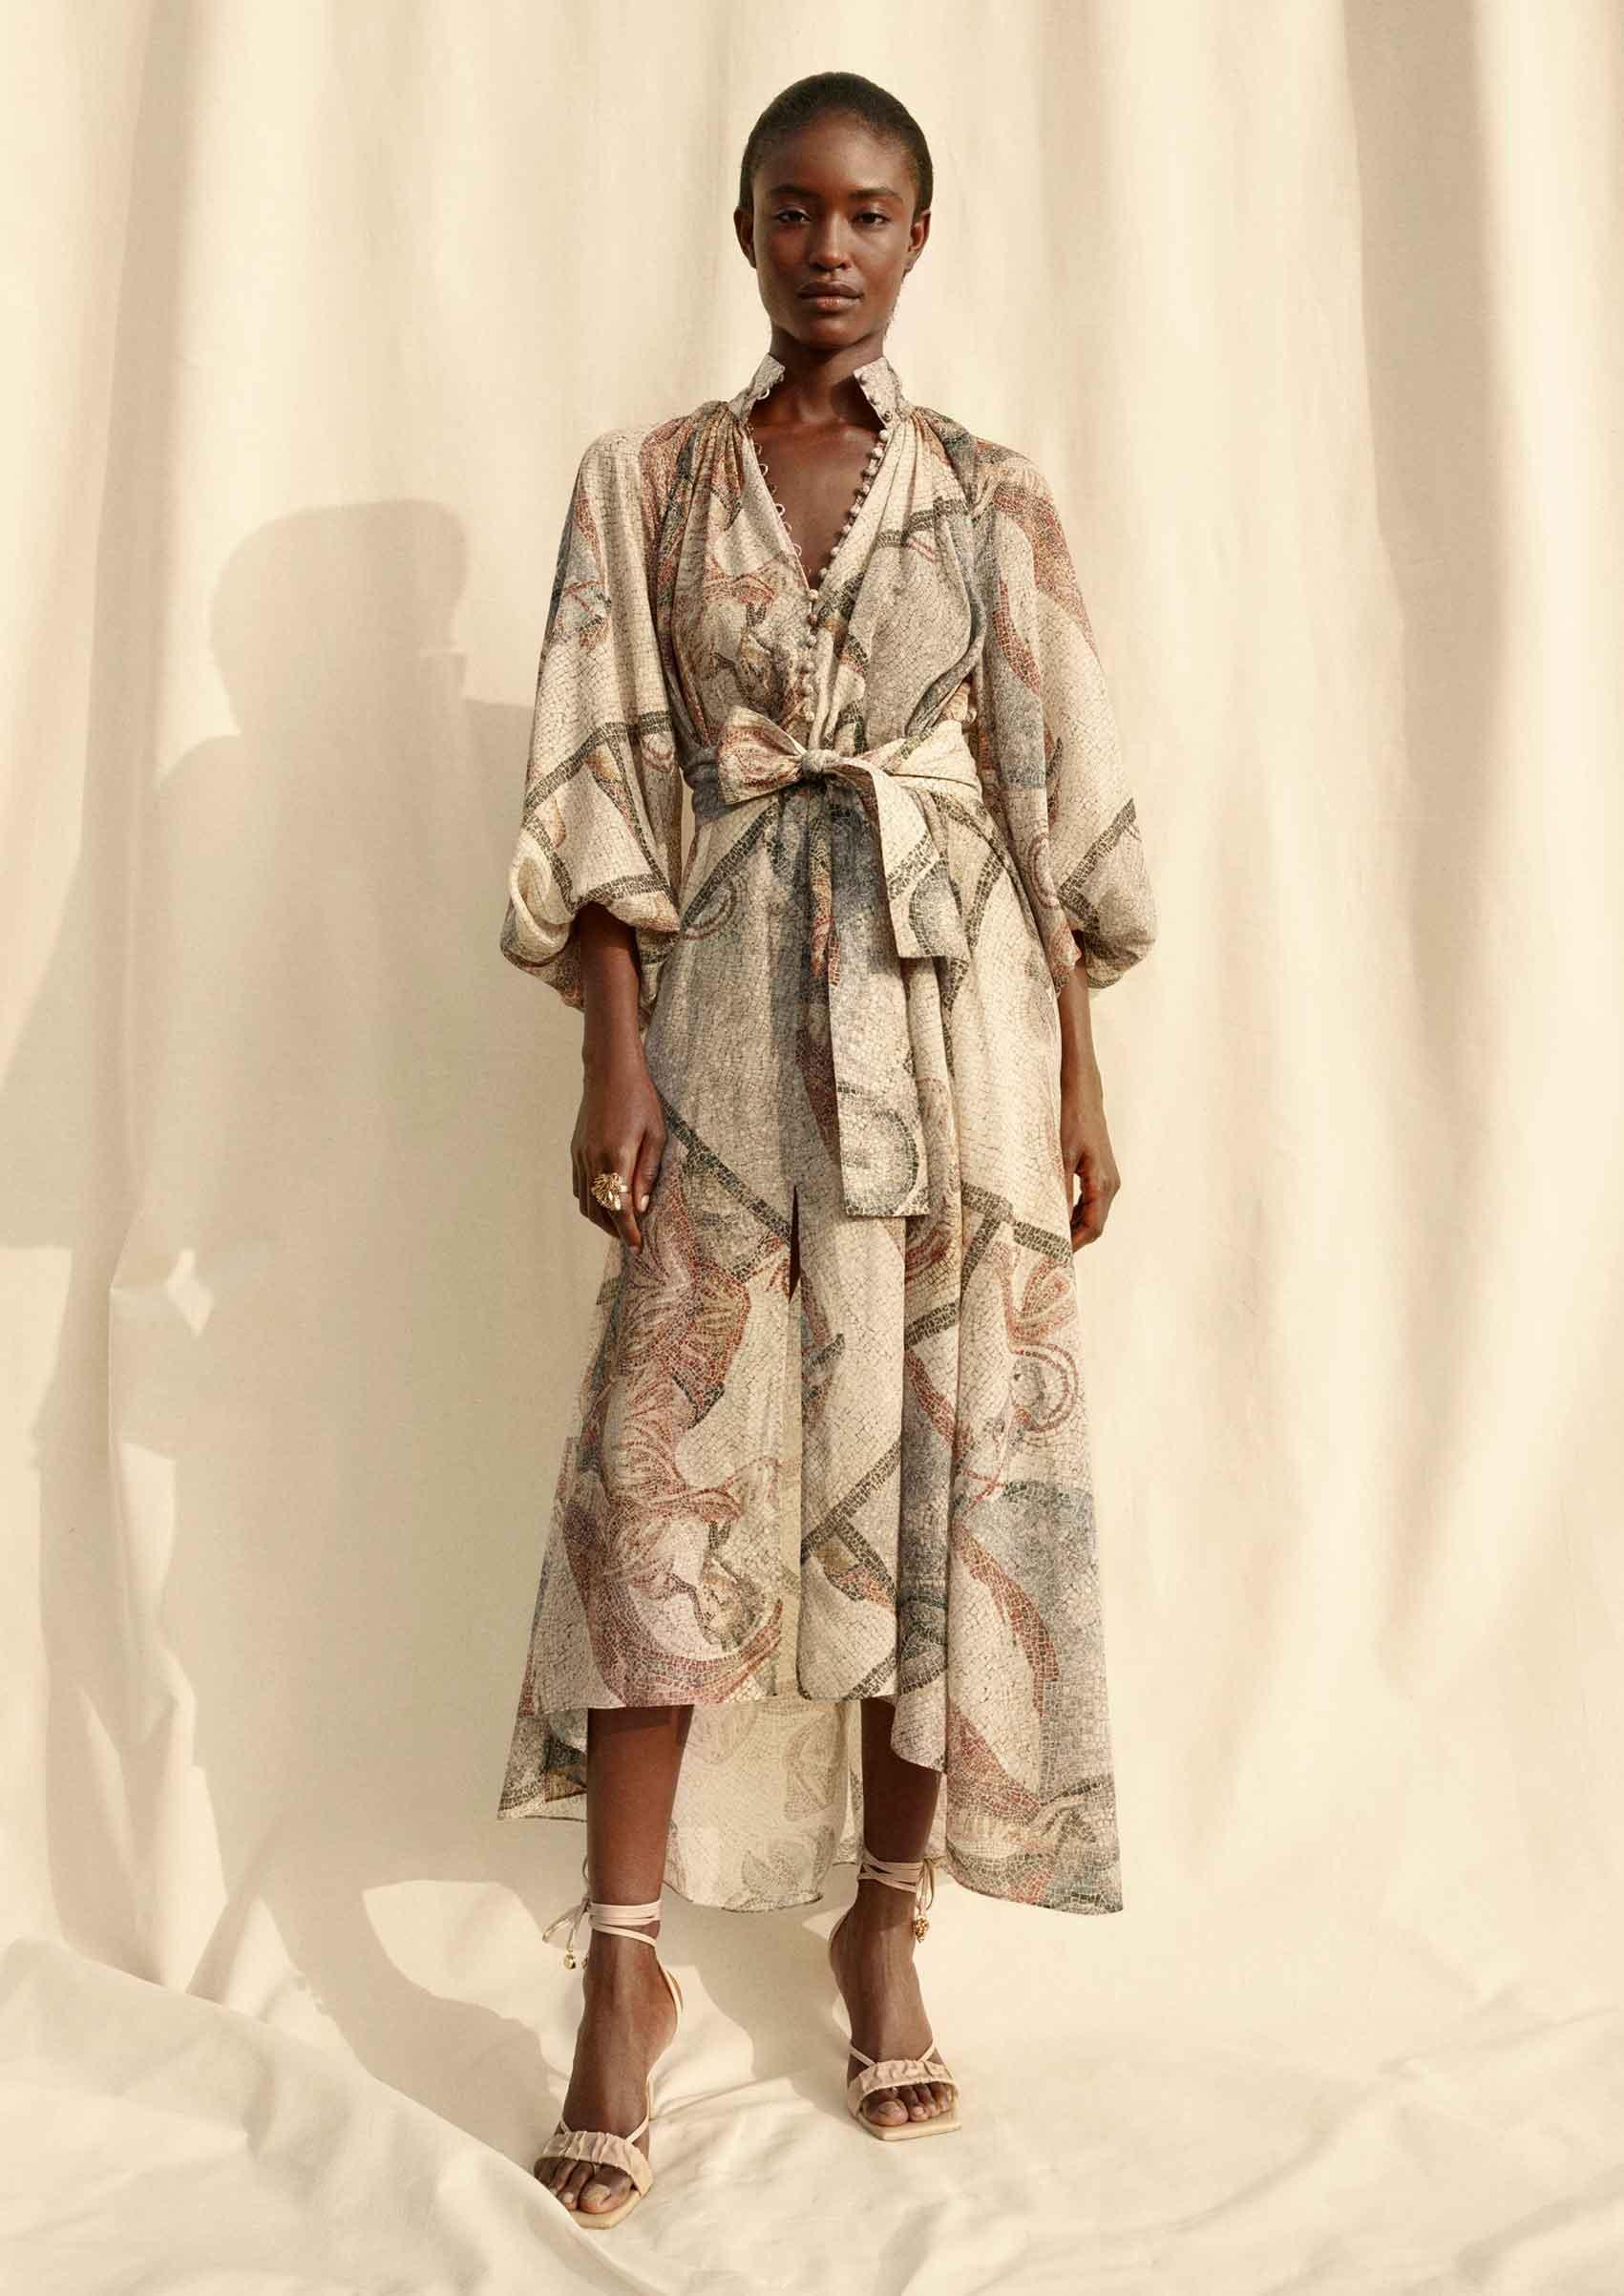 H&M. Conscious Exclusive. פריטי אופנה עשויים מתוצרי לוואי של תעשיית היין וחומרים נוספים בקולקציית אביב קיץ 2020-צילום: הנס מוריץ